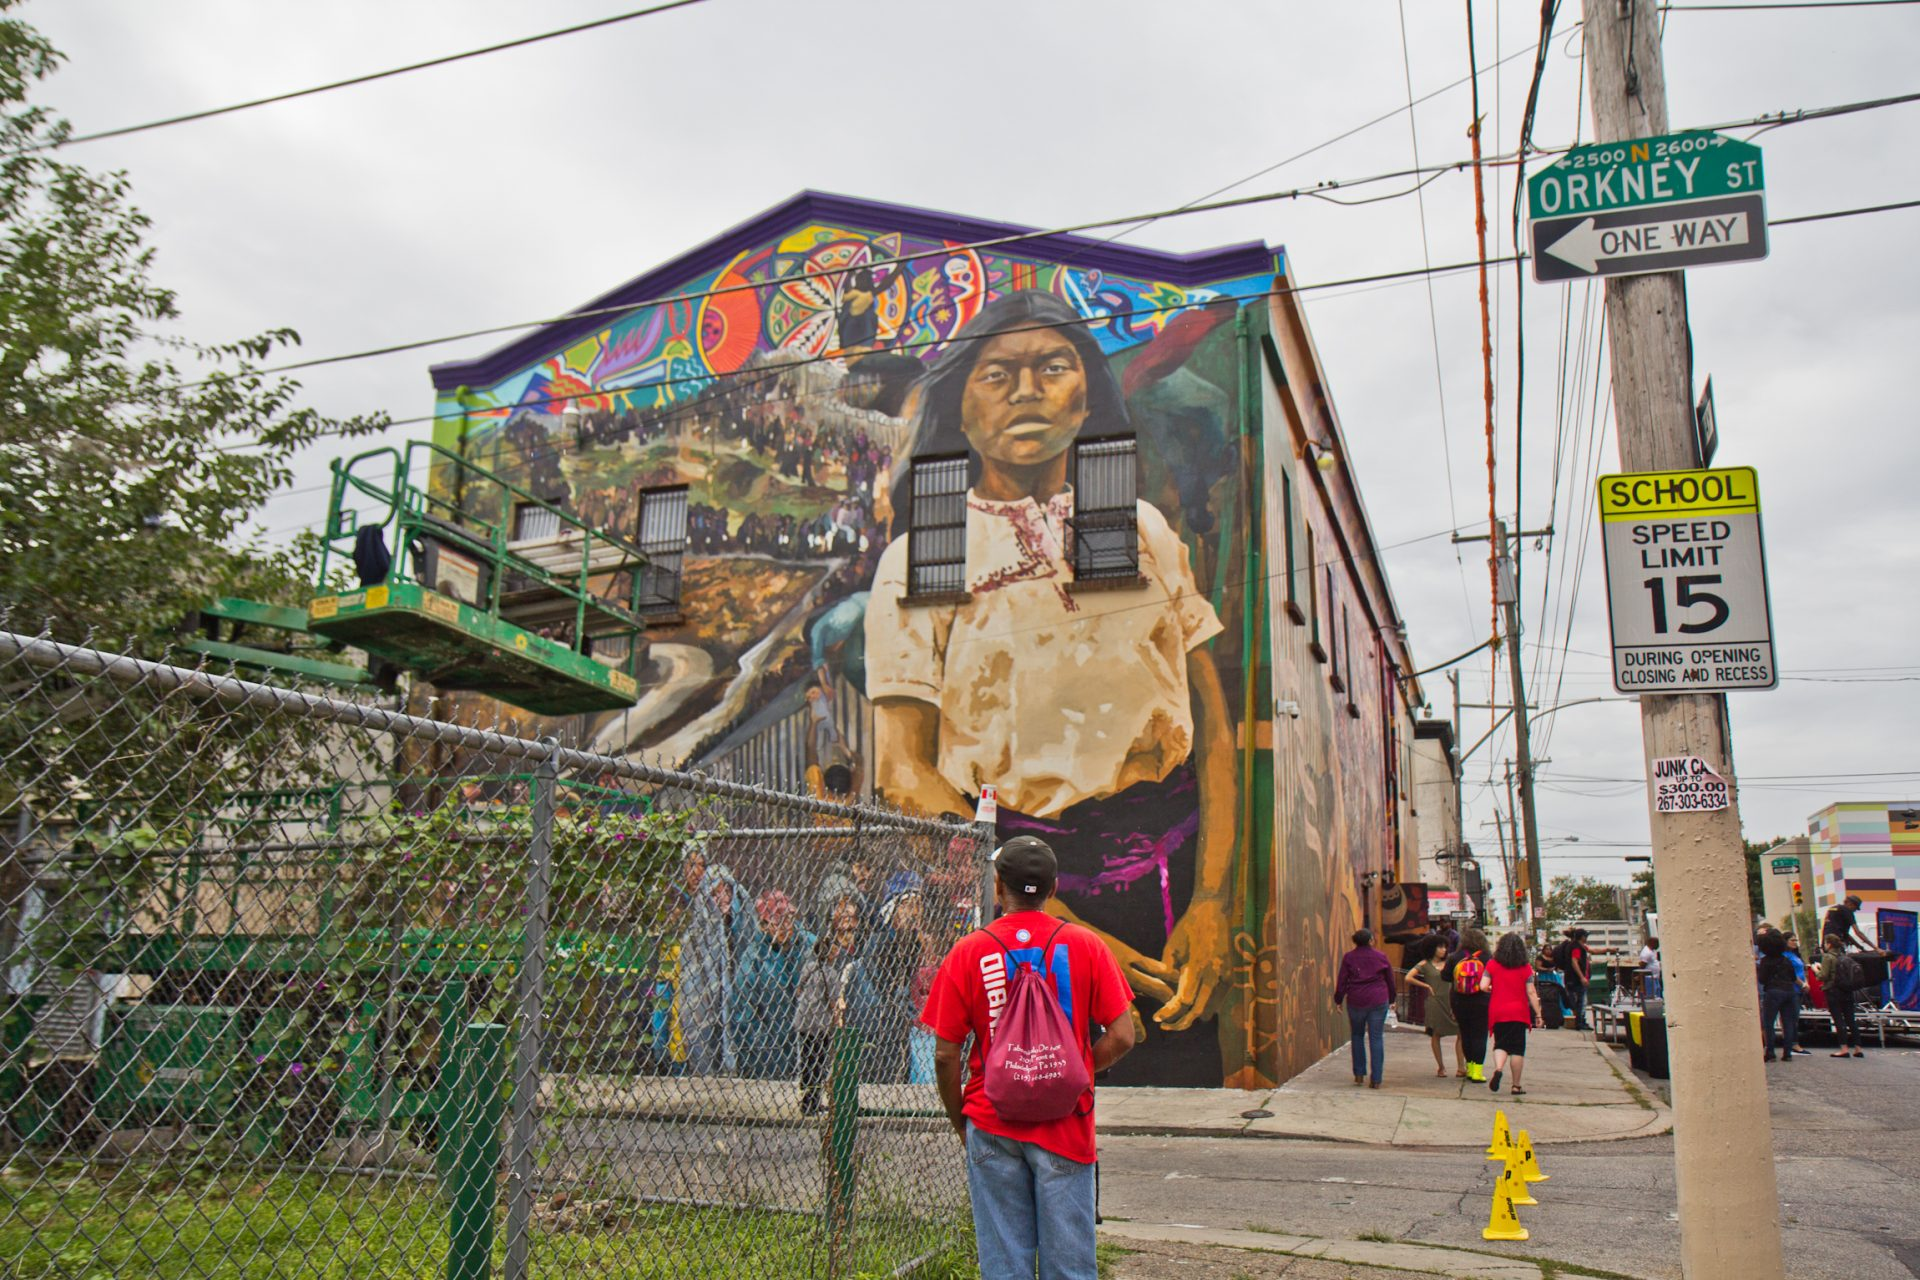 Sanctuary City, Sanctuary Neighborhood mural